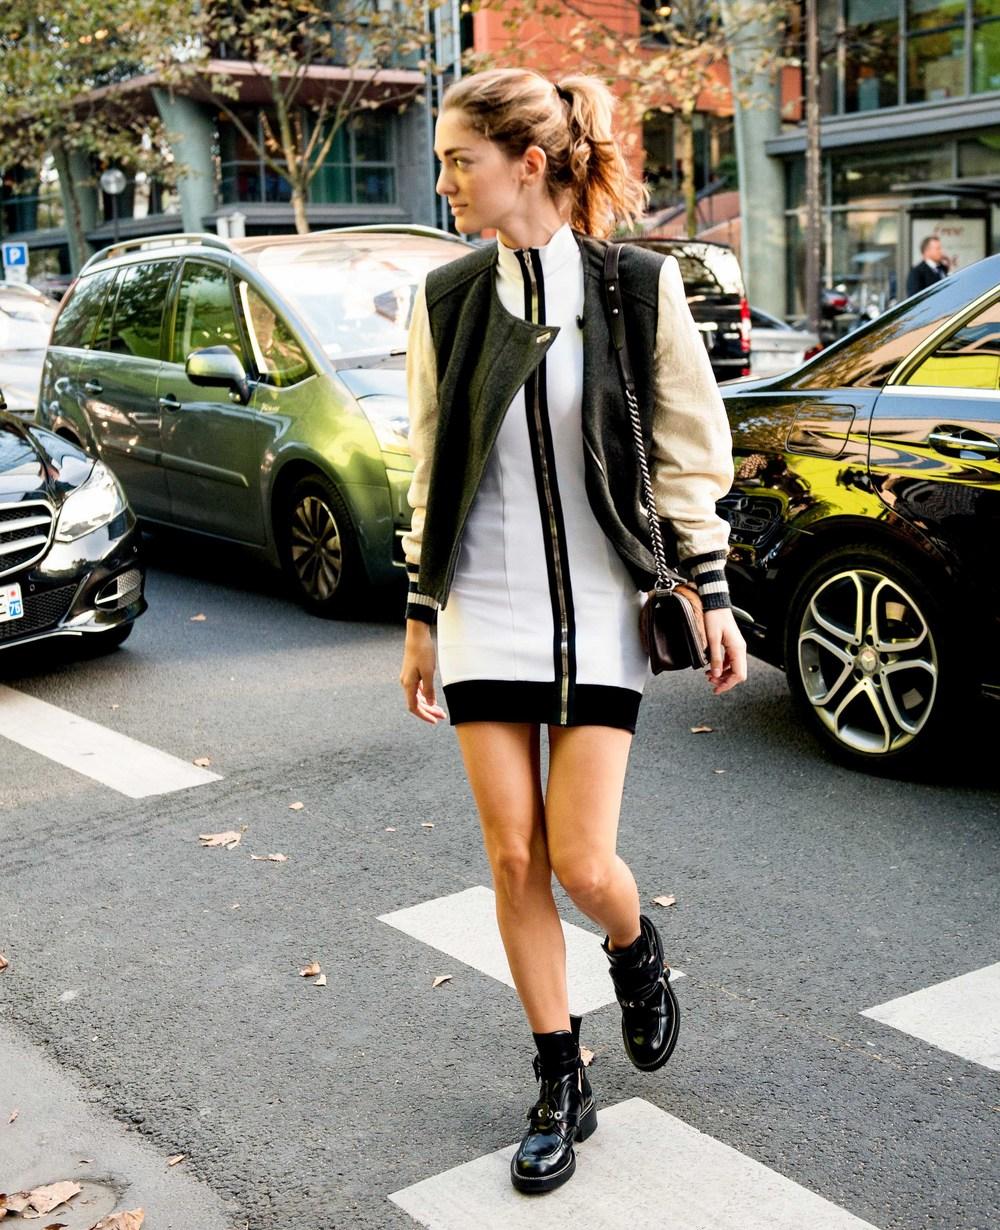 StreetStyle_ParisFashionWeek_LeandroJusten_151.jpg